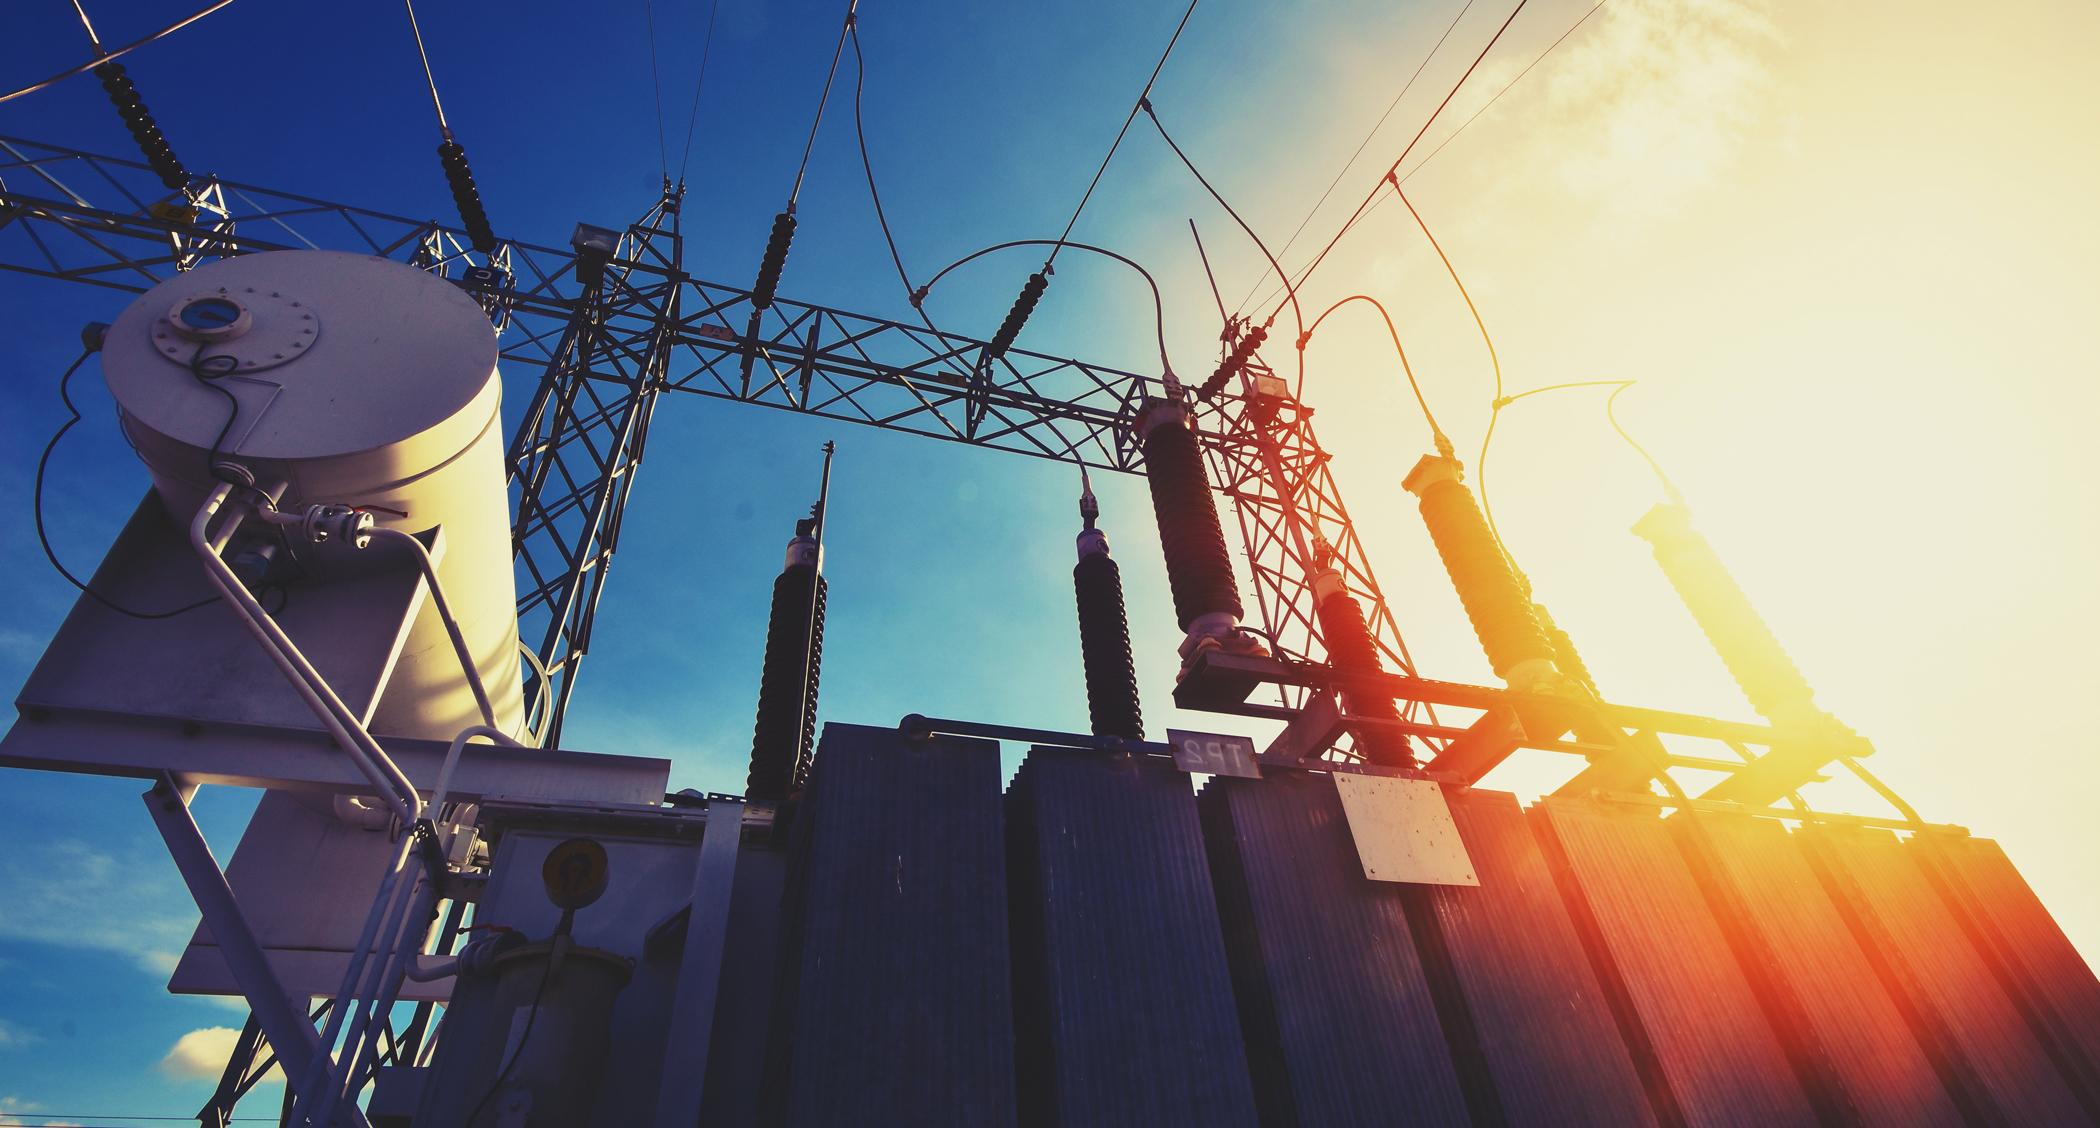 transformadores eléctricos en mérida